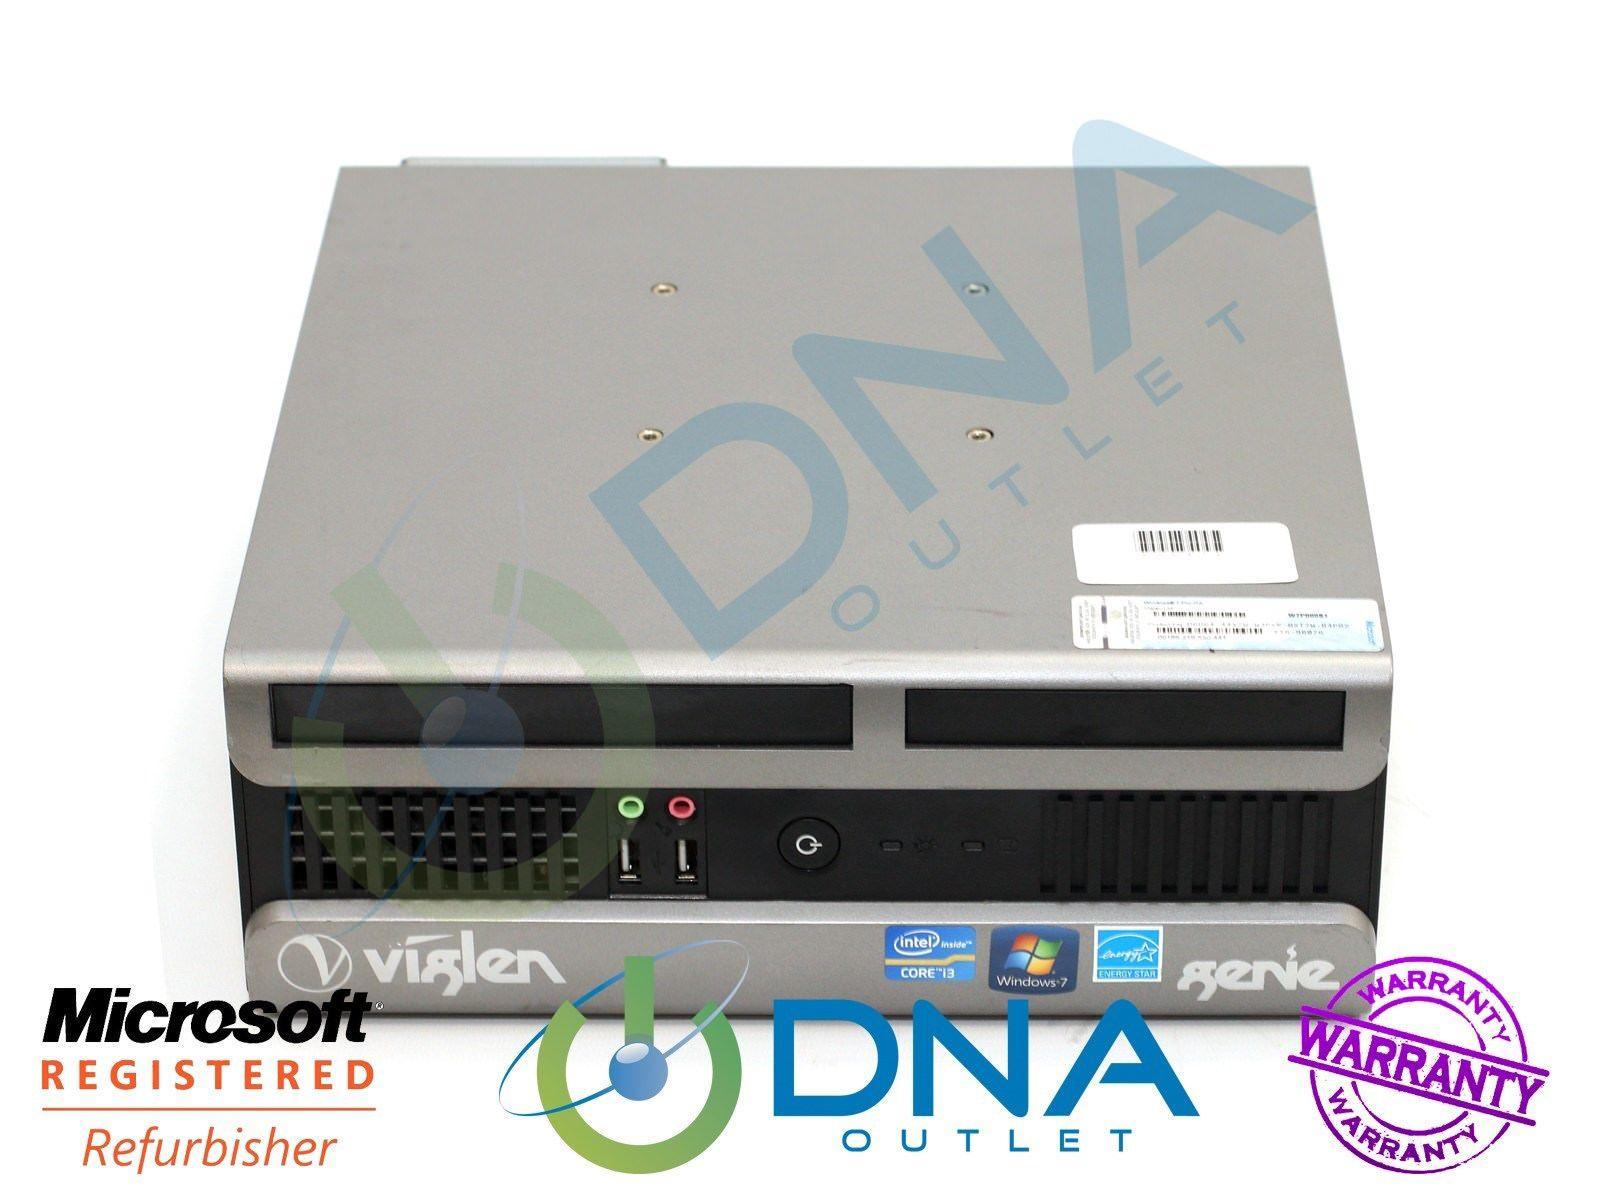 Pre-owned VIGLEN GENIE CORE i3 3220 SFF DESKTOP PC - 3.00GHz/4GB/500GB/WINDOWS 10 PRO - £63.98 @ eBay / dna-outlet